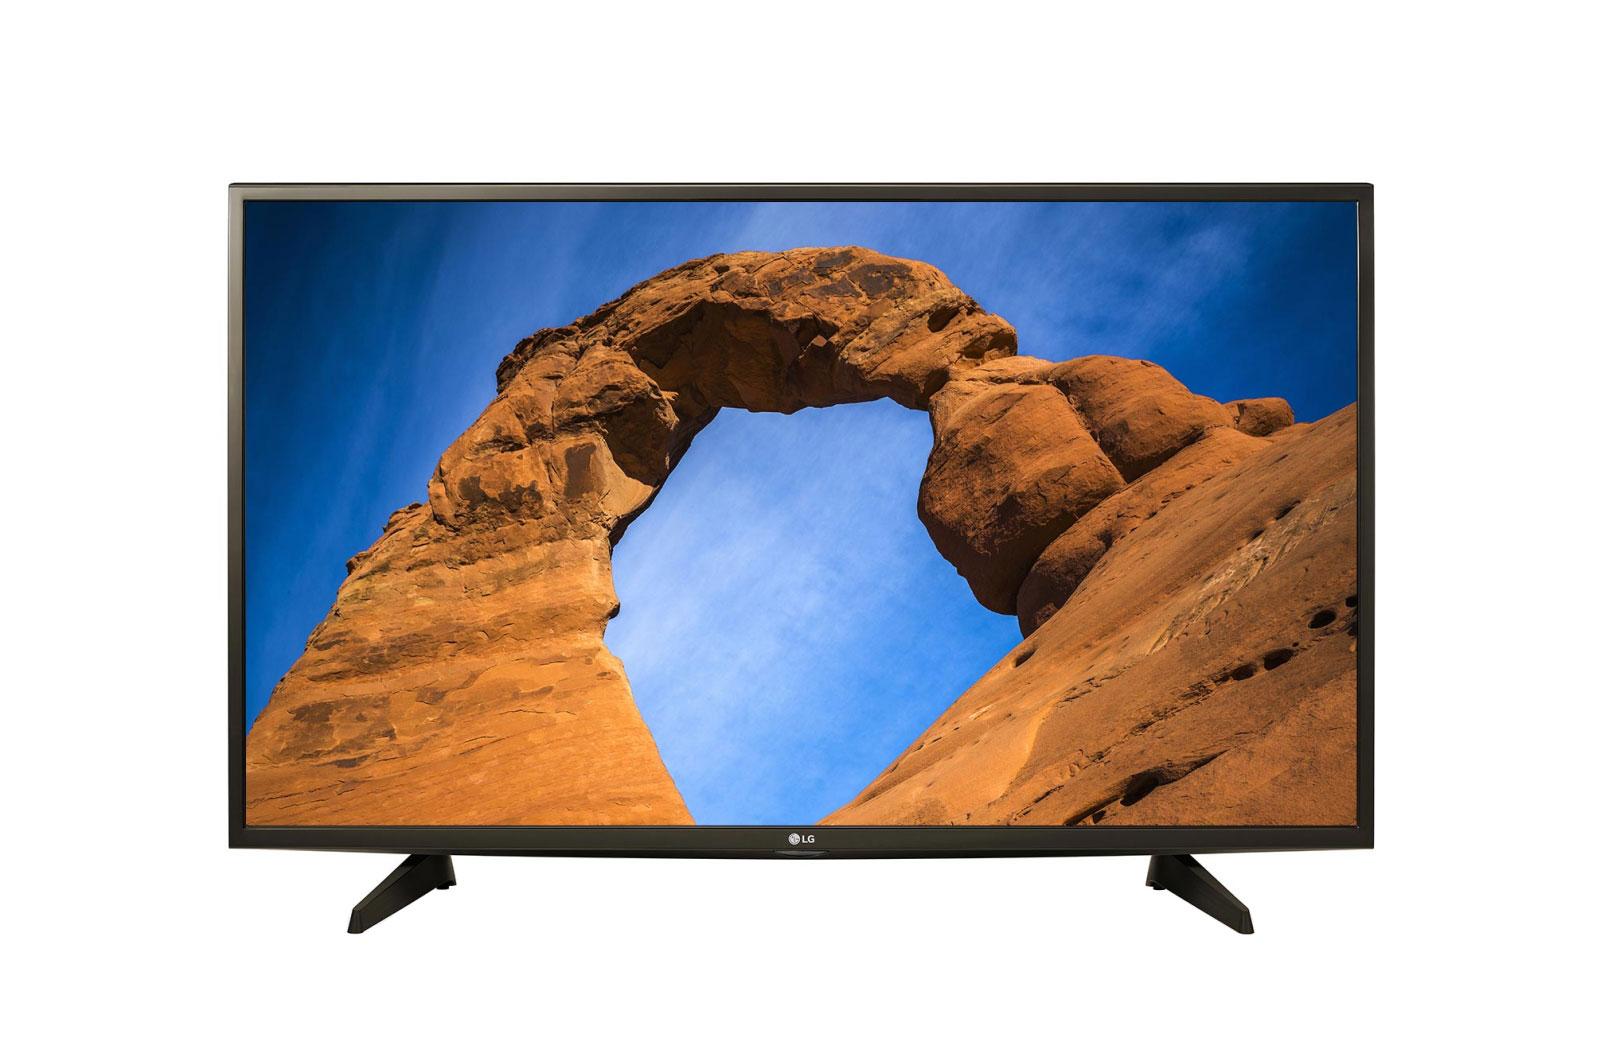 LG 43 Inch Full HD LED TV - 43LK5100PVB